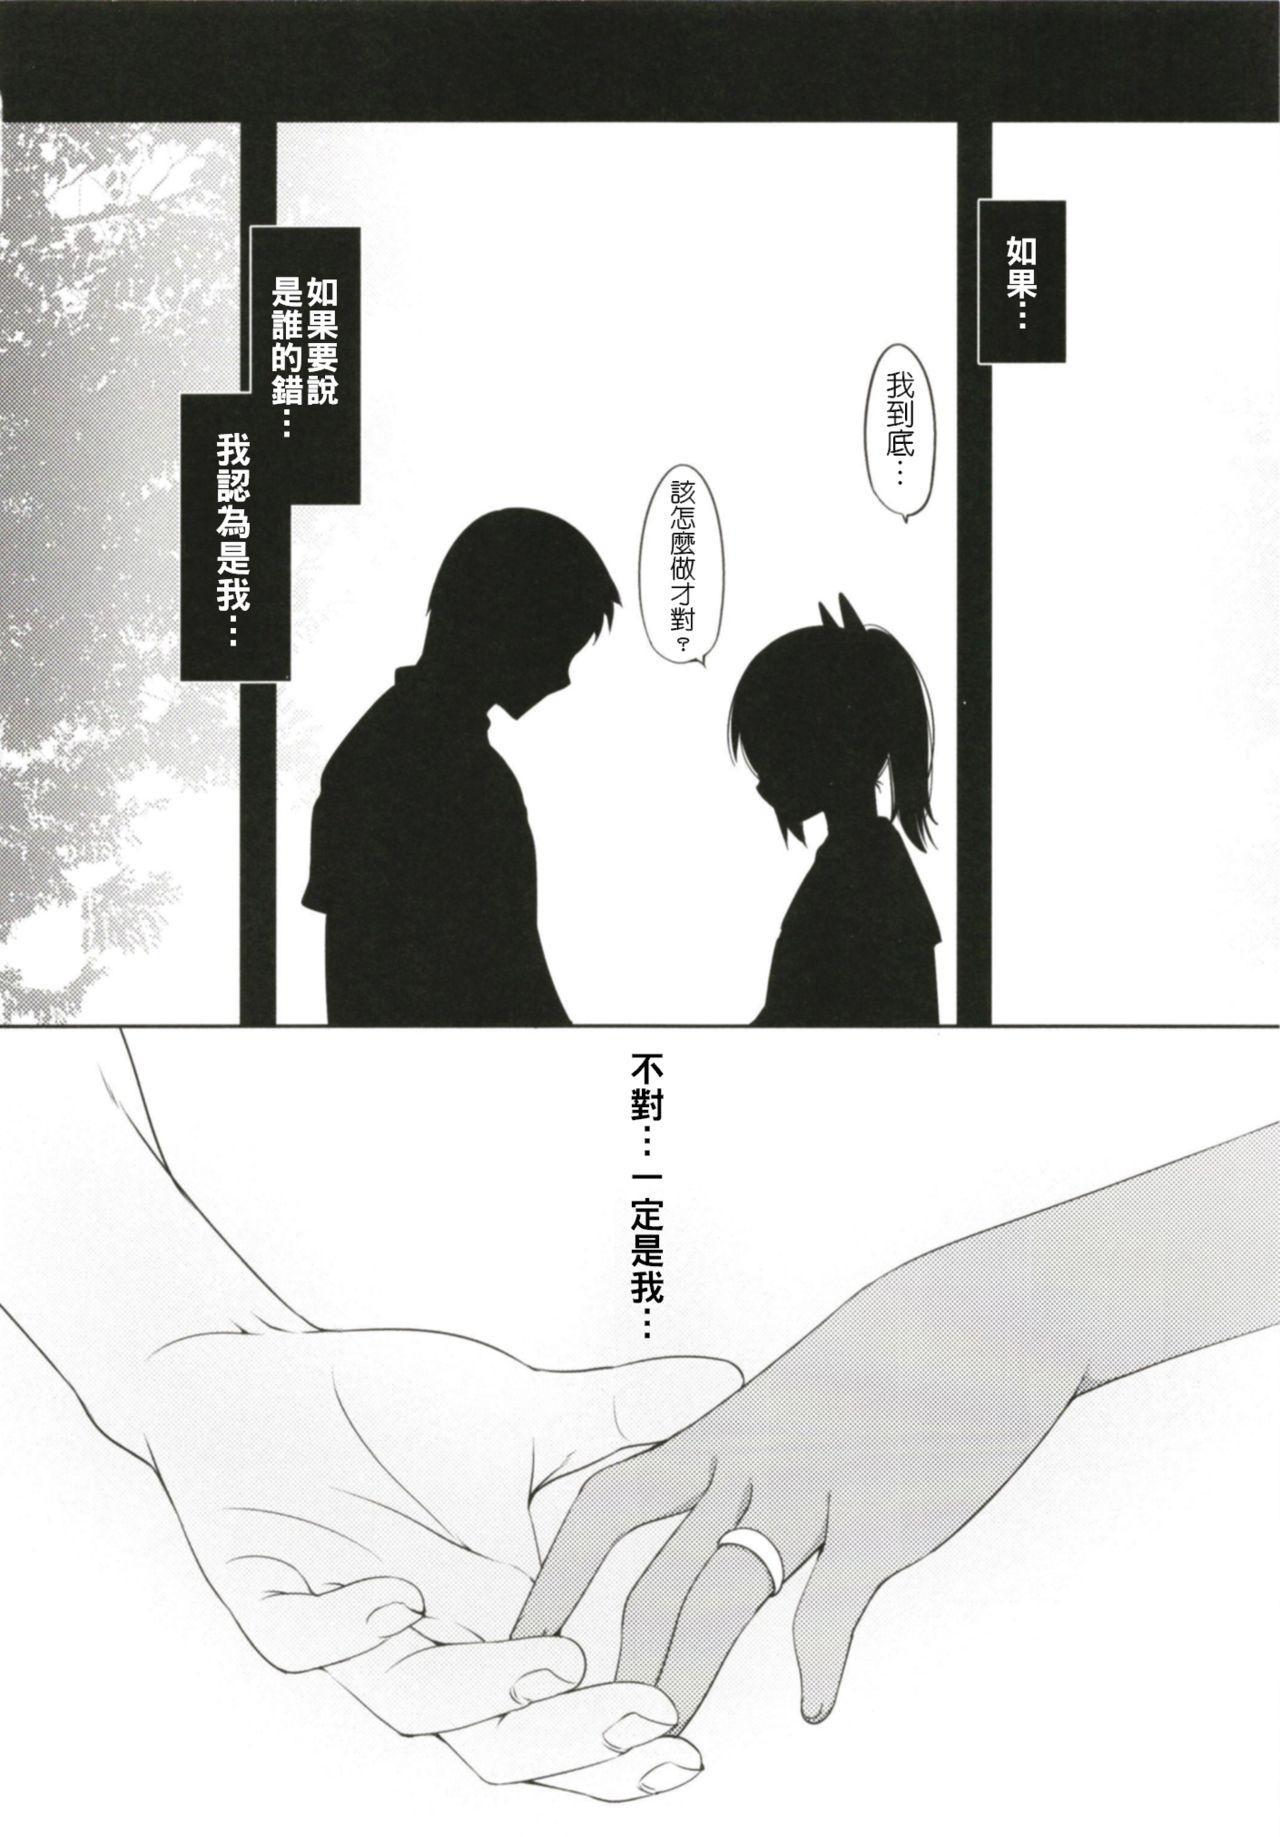 [French letter (Fujisaki Hikari)] Hitonatsu no Ayamachi -I-401 Soushuuhen- (Kantai Collection -KanColle-) [Chinese] [Digital] 57